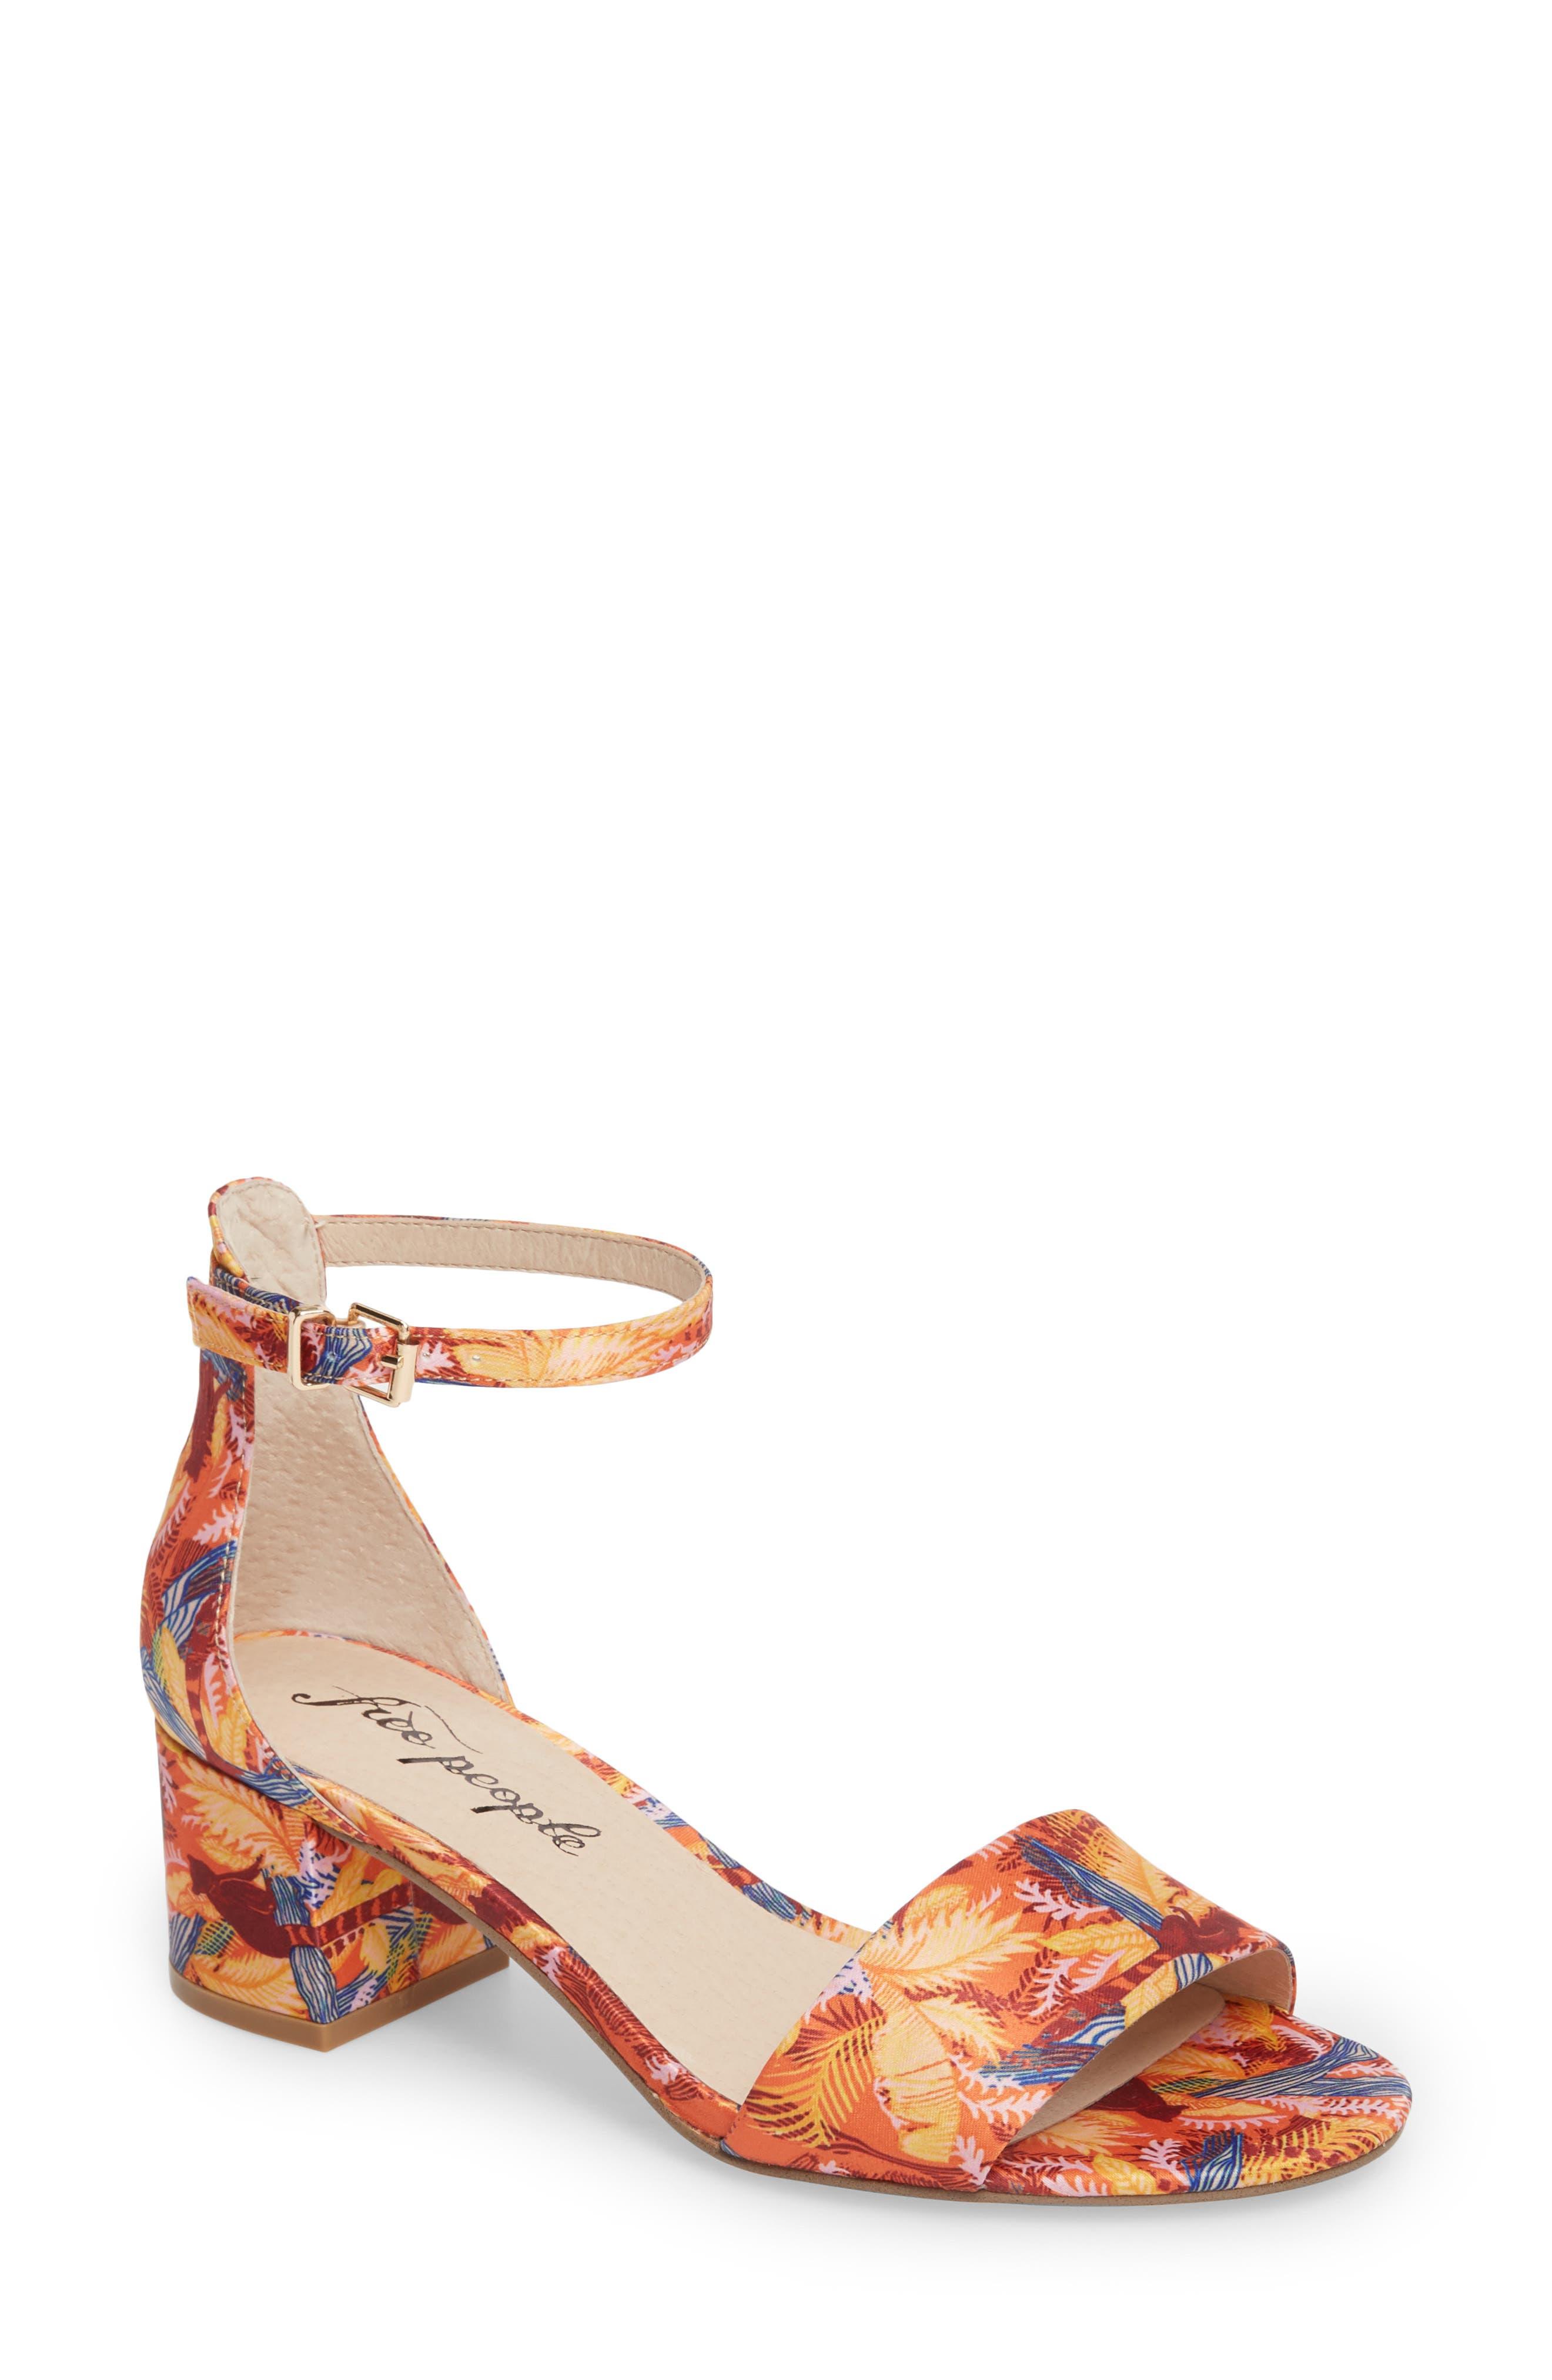 Marigold Block Heel Sandal,                             Main thumbnail 1, color,                             Orange Combo